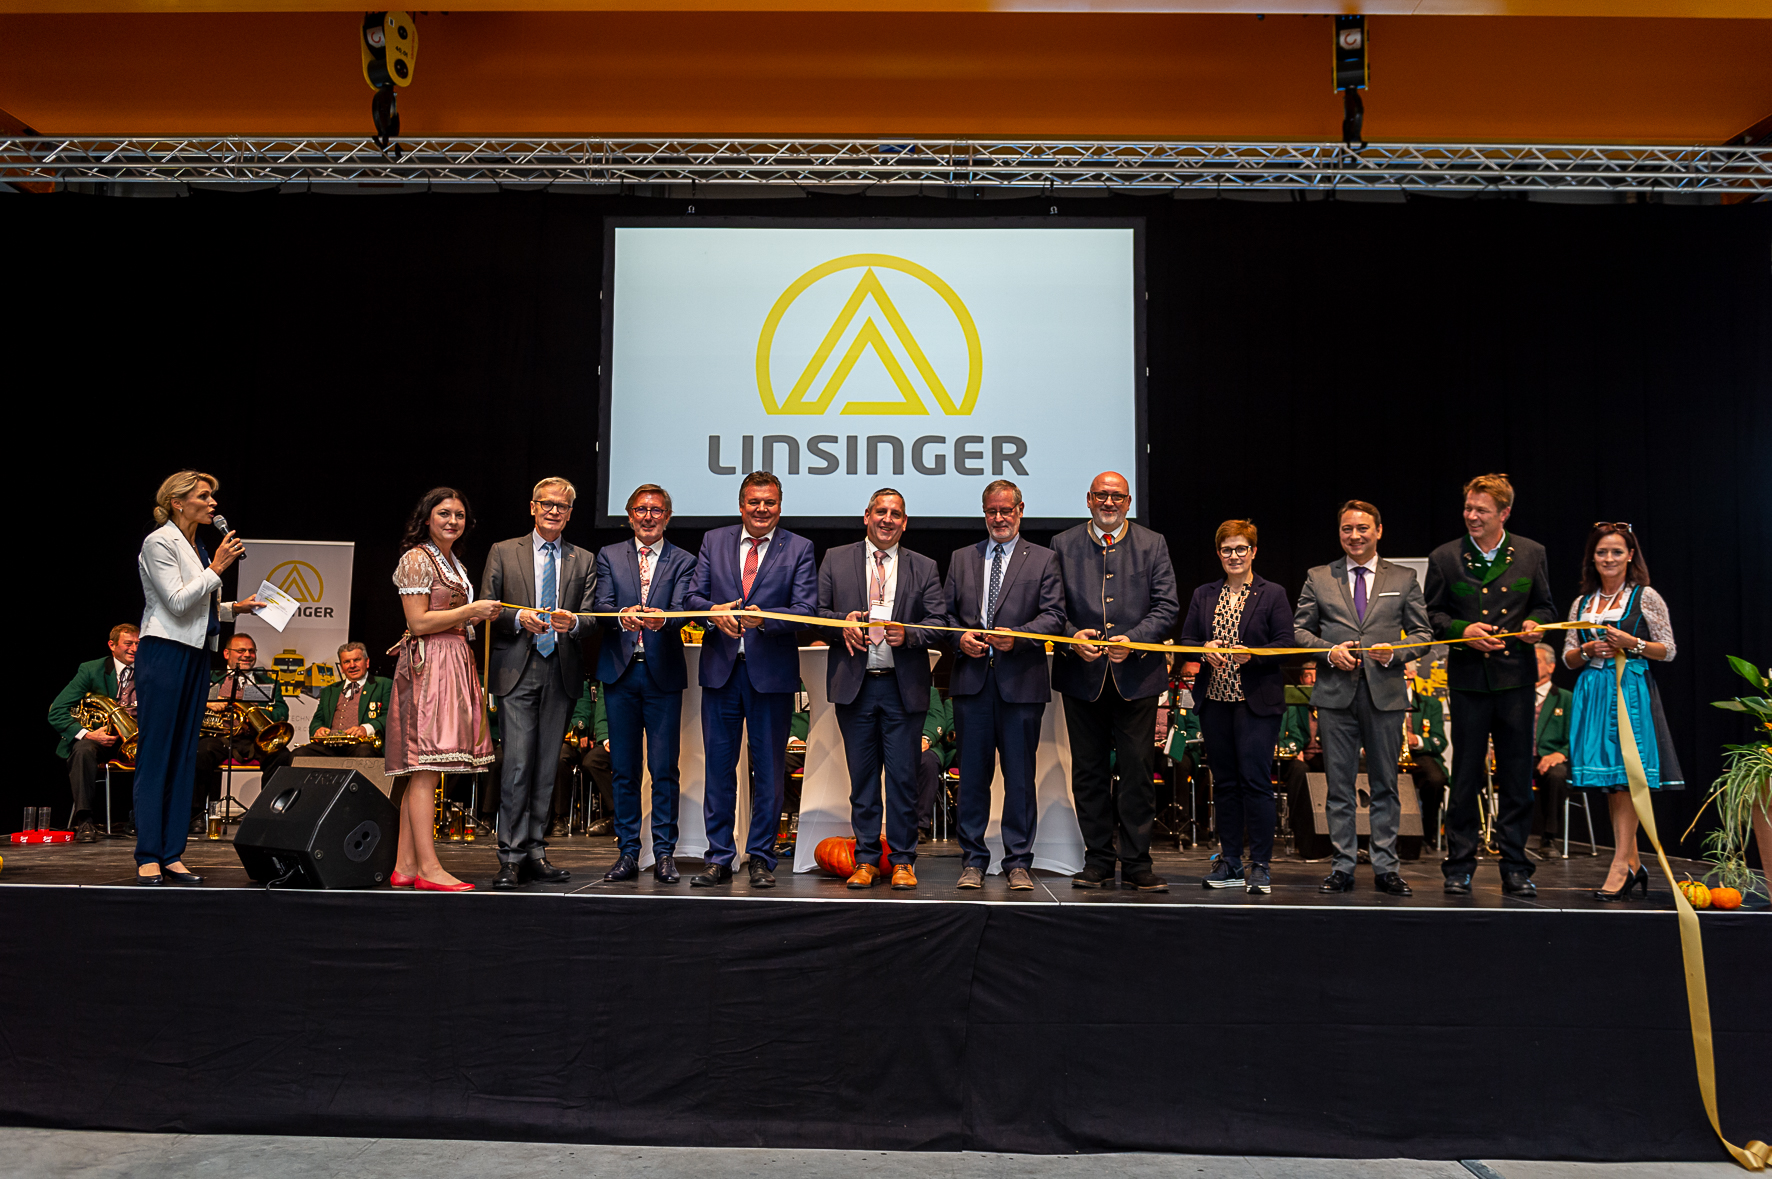 Linsinger celebrates 80 years